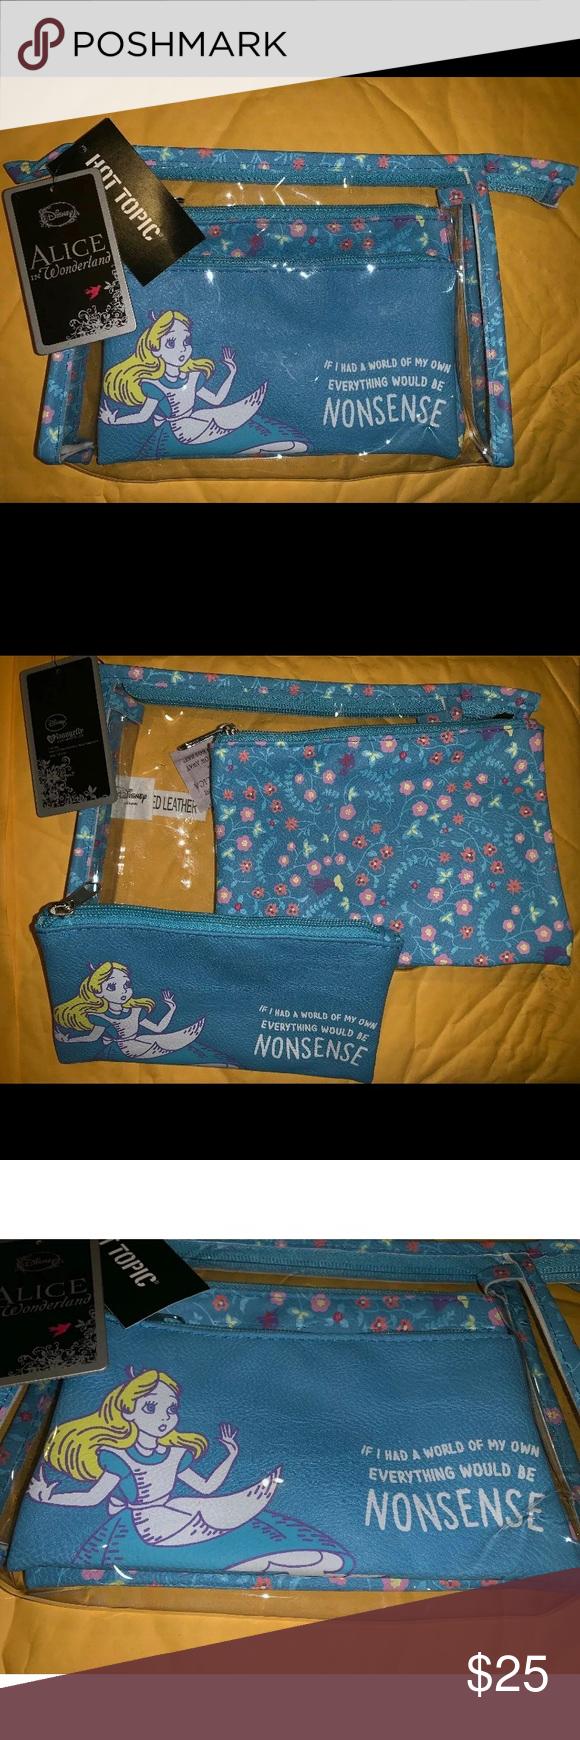 disney loungefly alice in wonderland makeup bag nwt